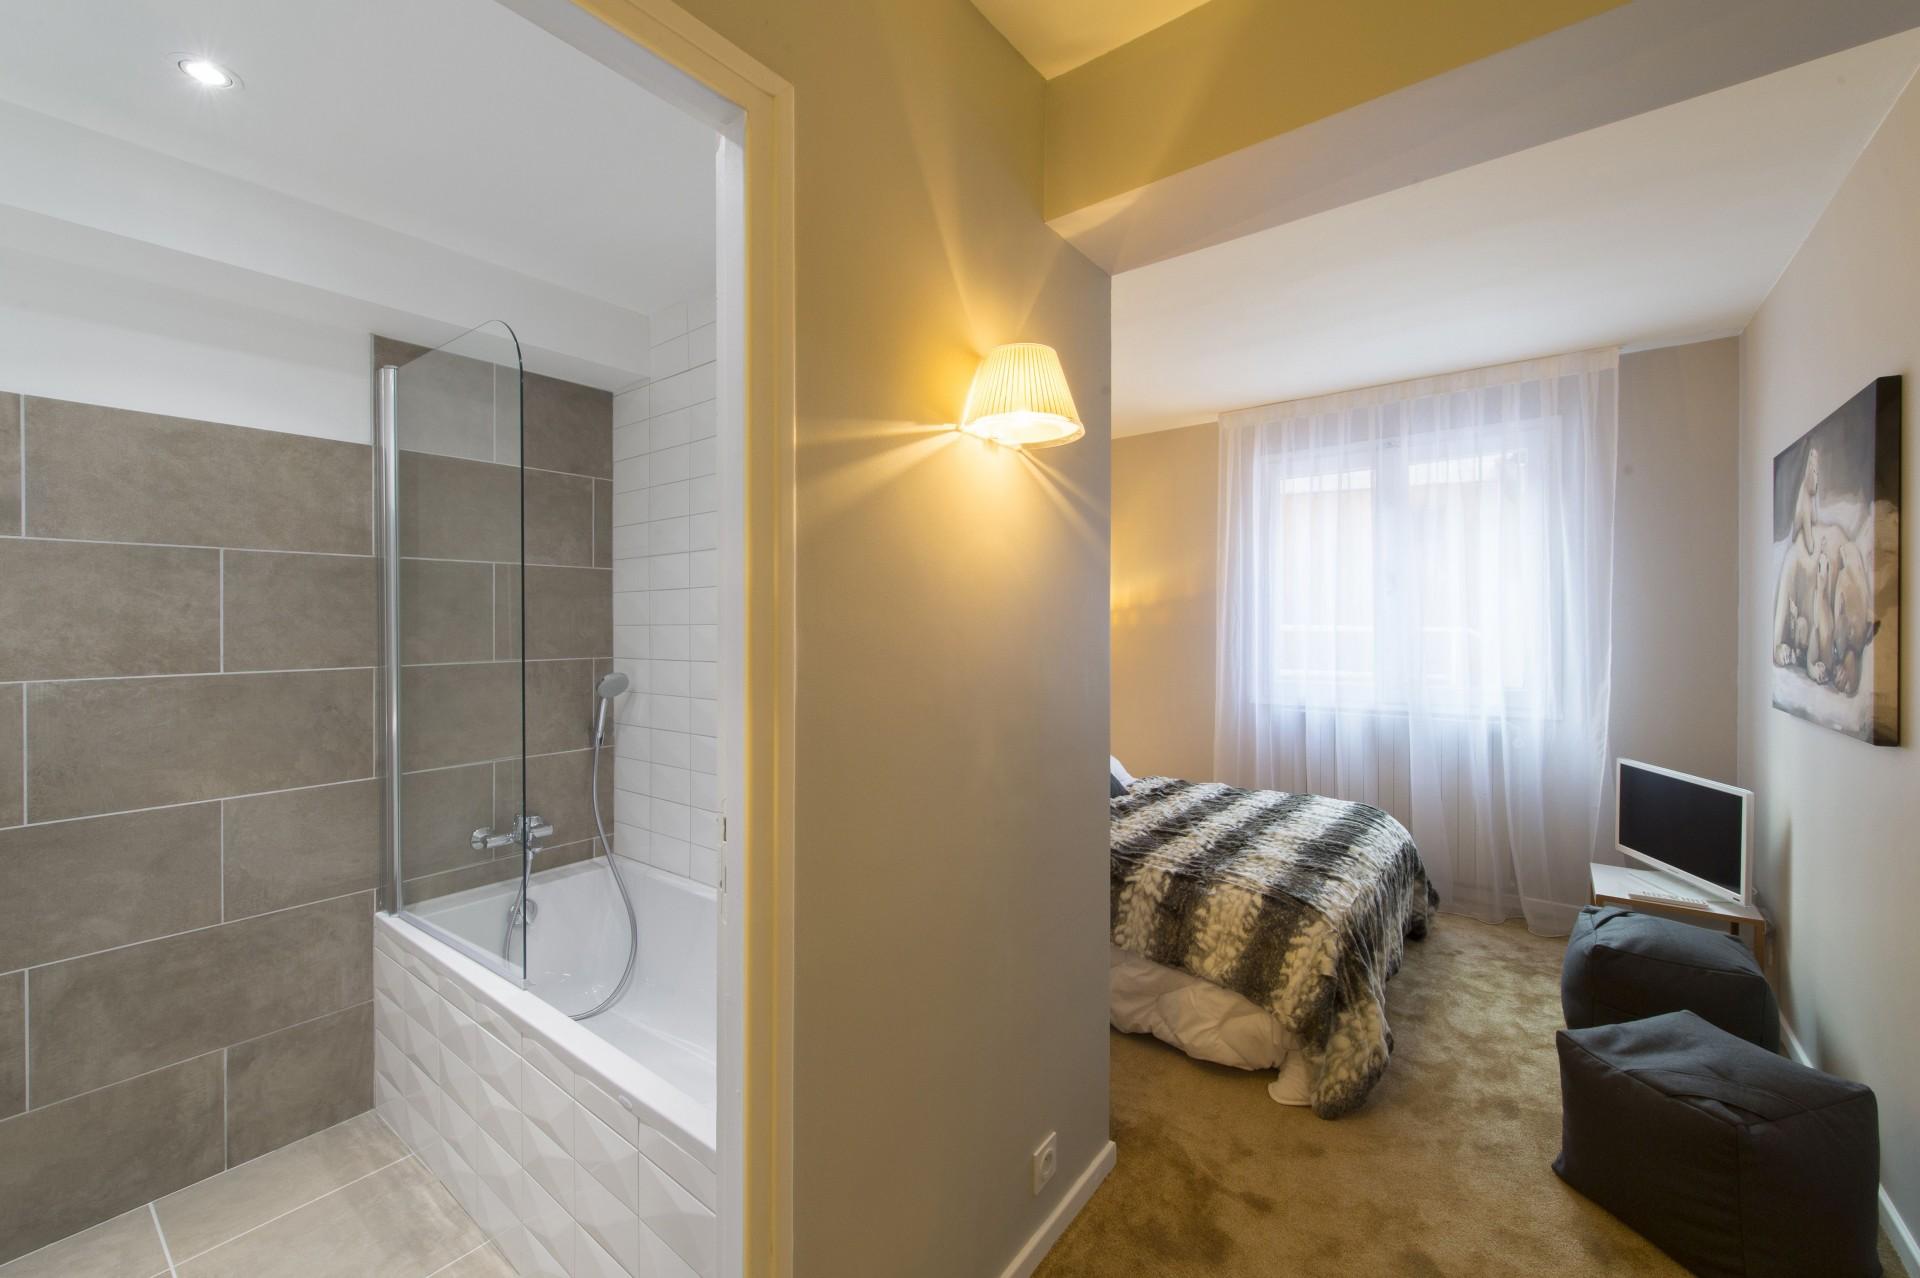 Courchevel 1850 Luxury Rental Appartment Taramite Bathroom 3